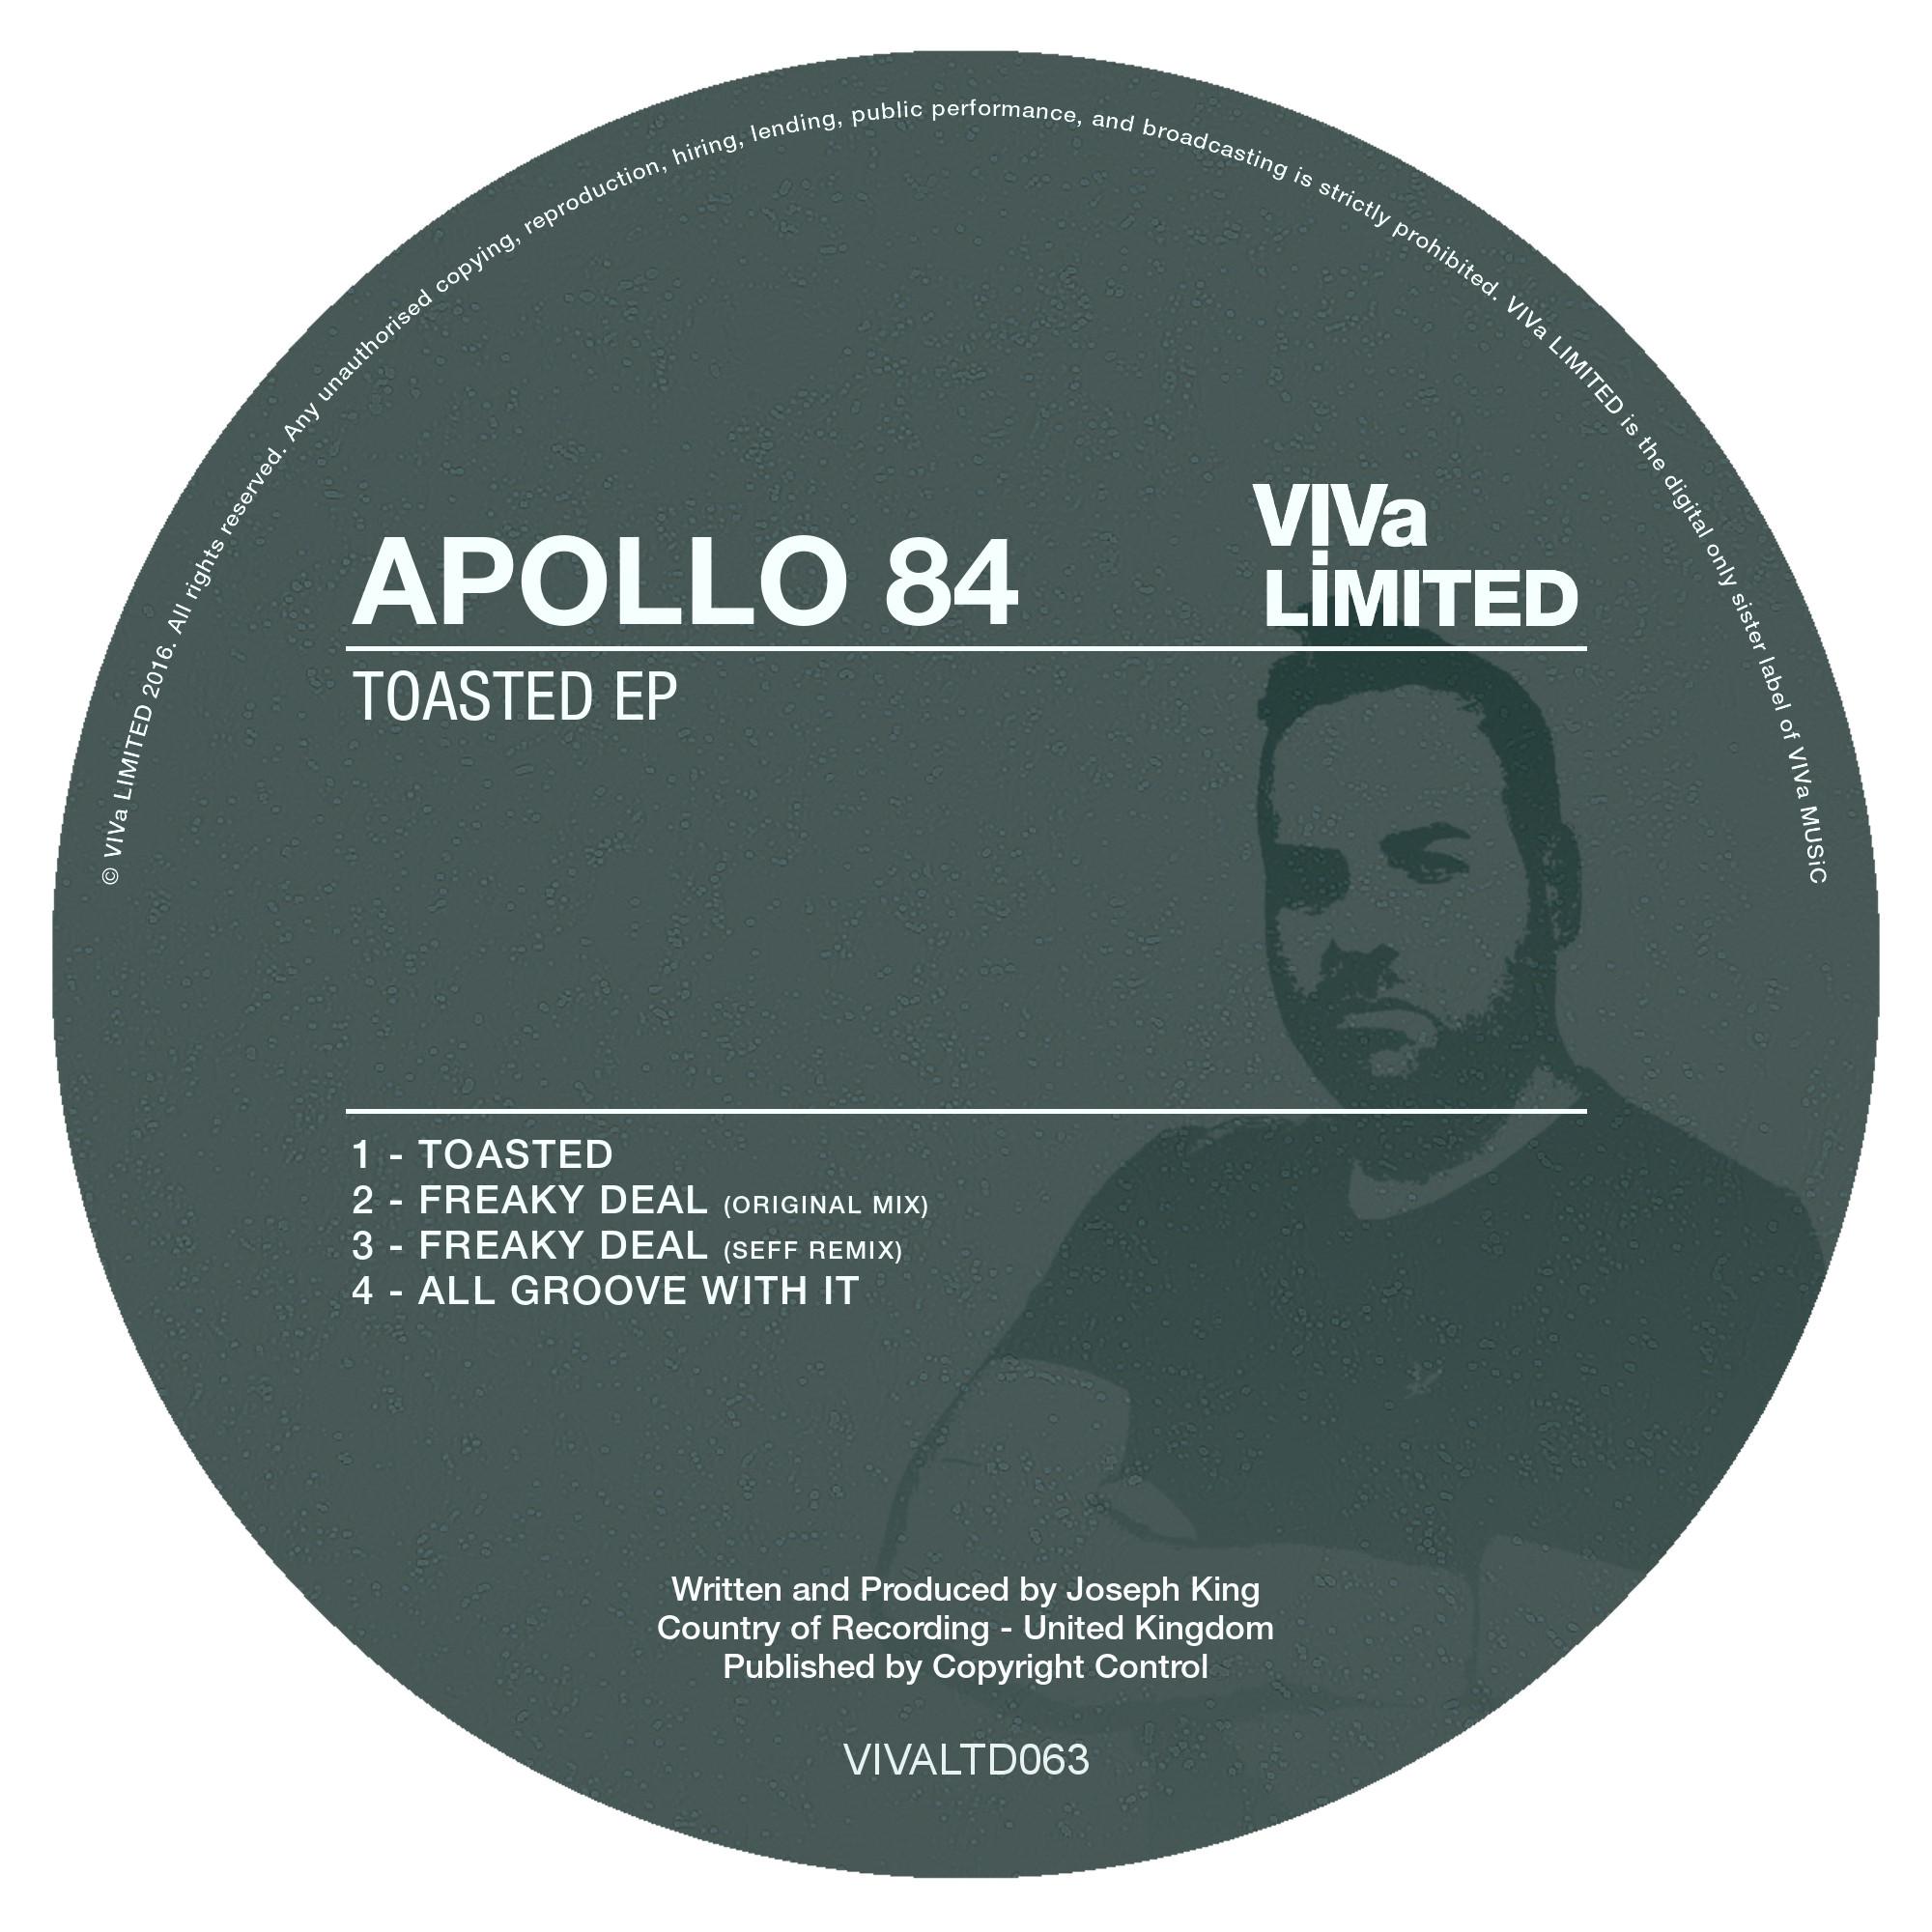 Apollo 84 – Toasted (VIVa Limited)